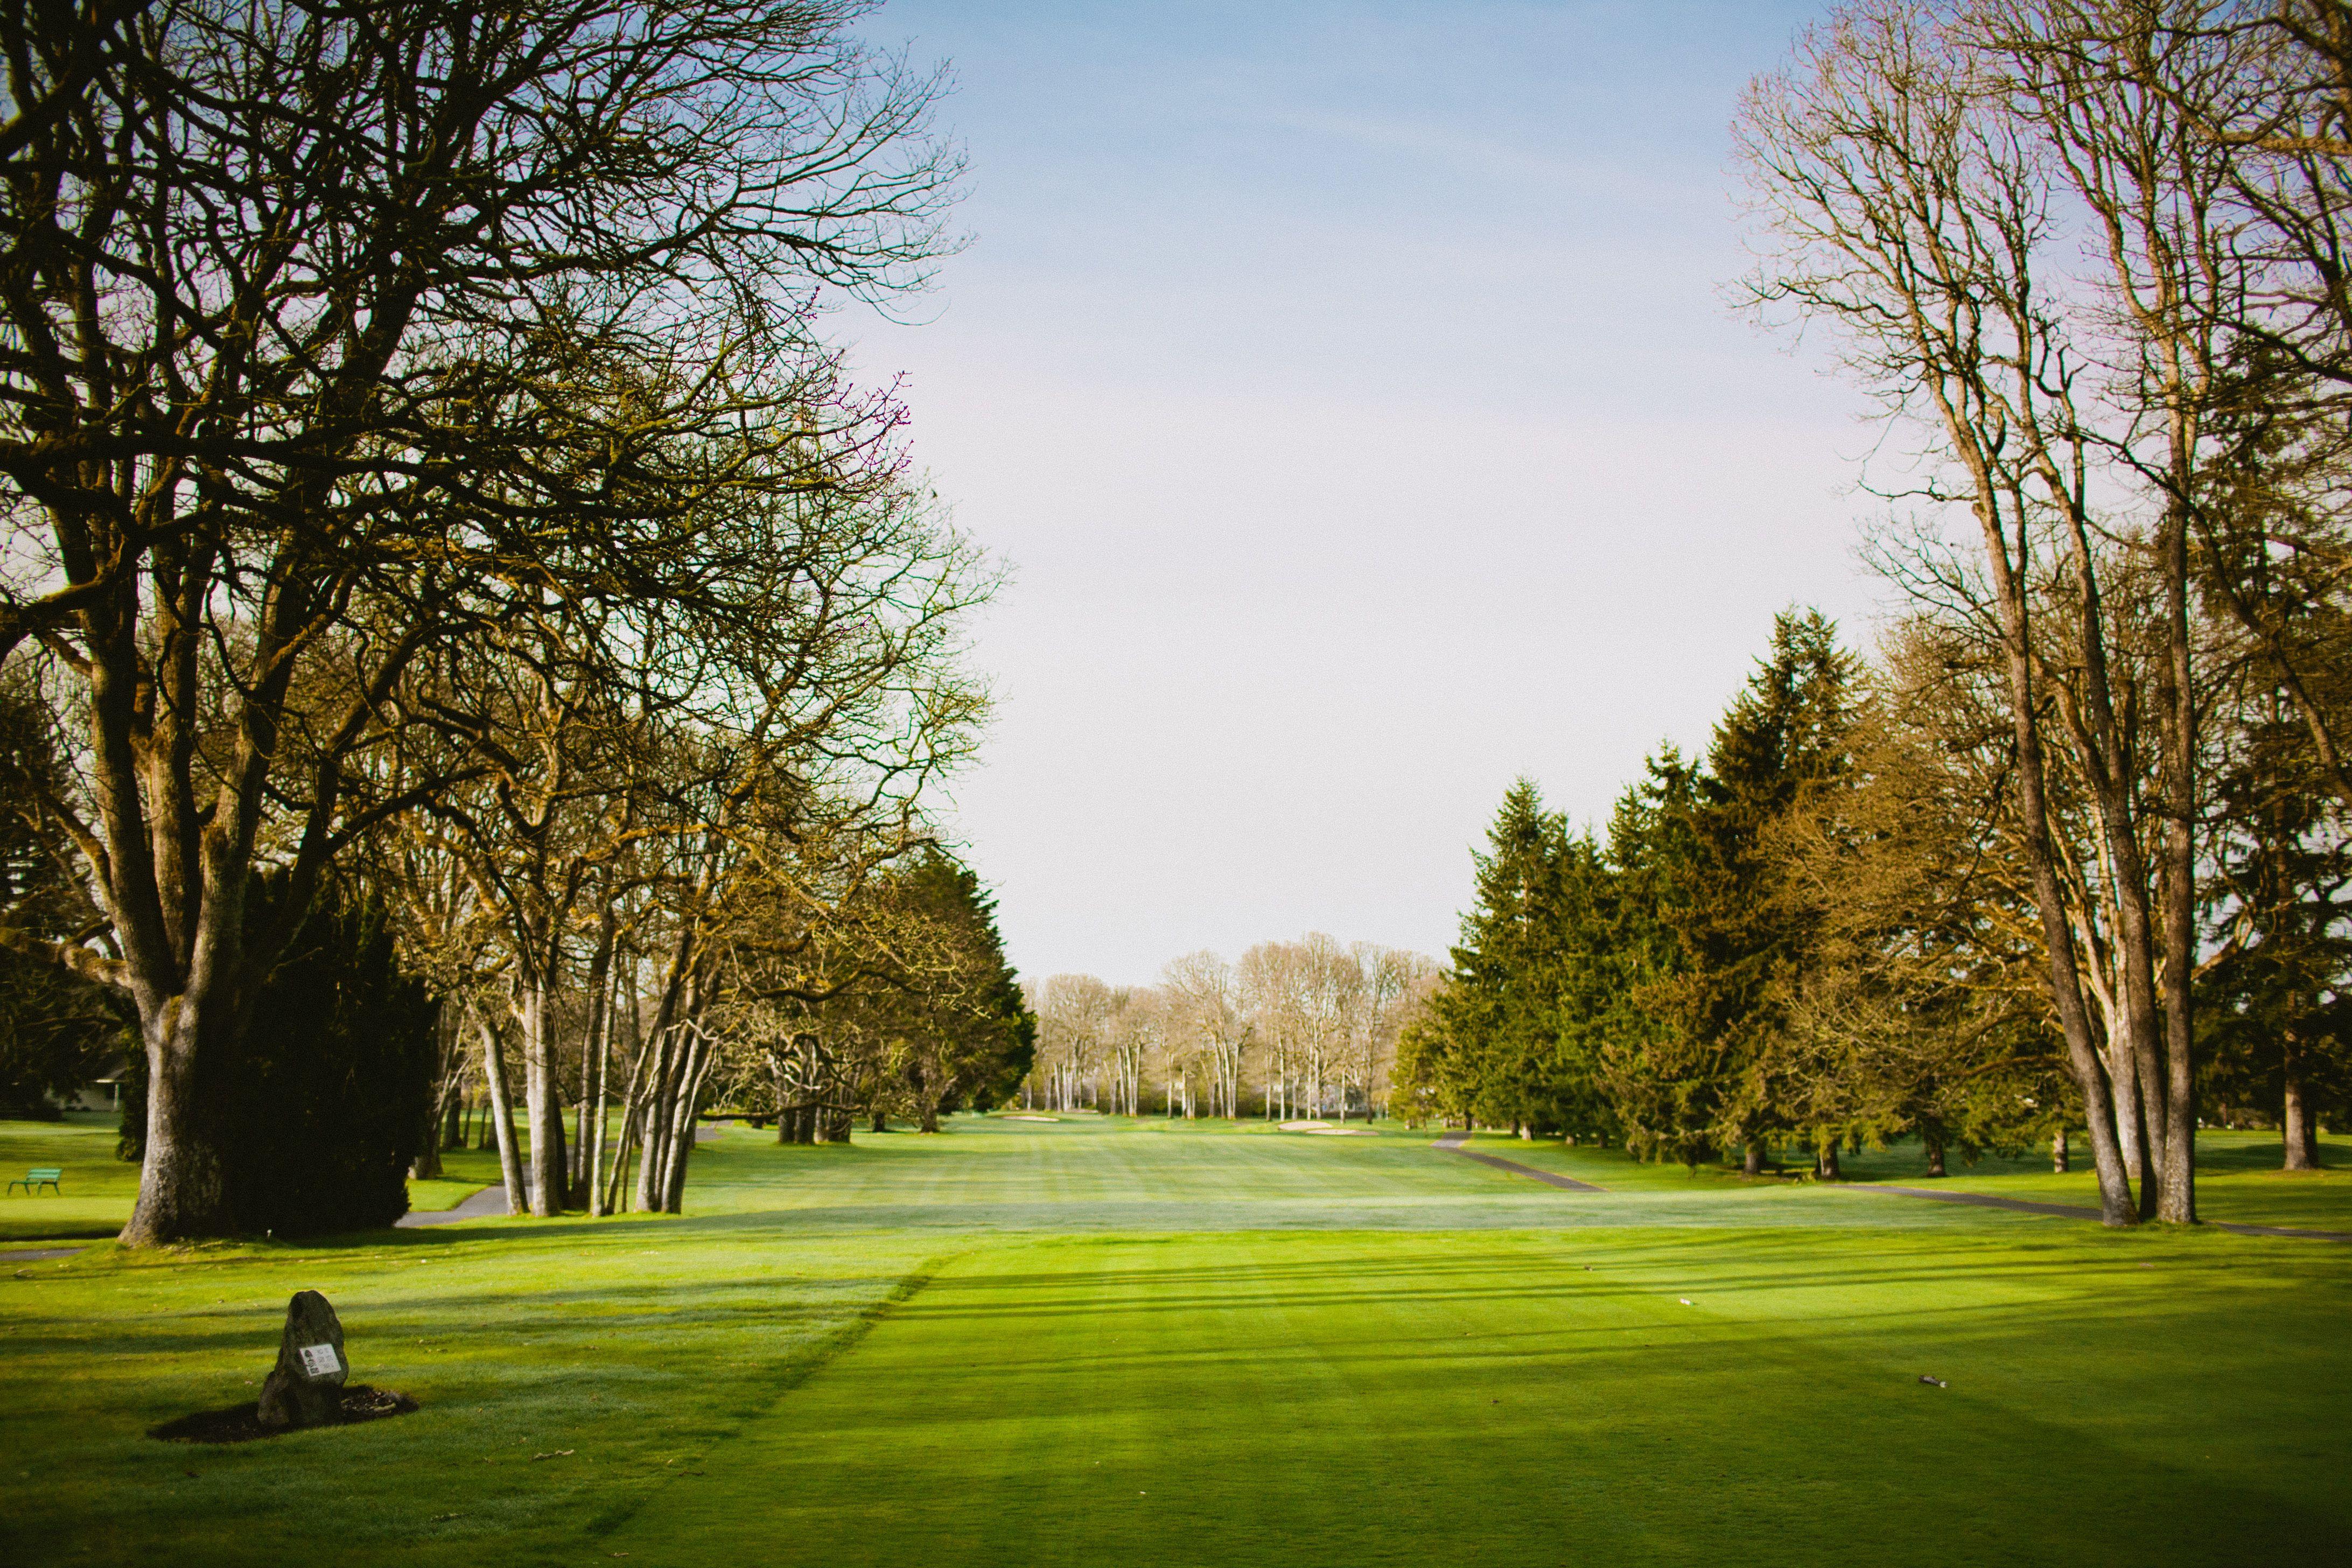 Looking down the green at Oakbrook Golf Club, Lakewood, WA.